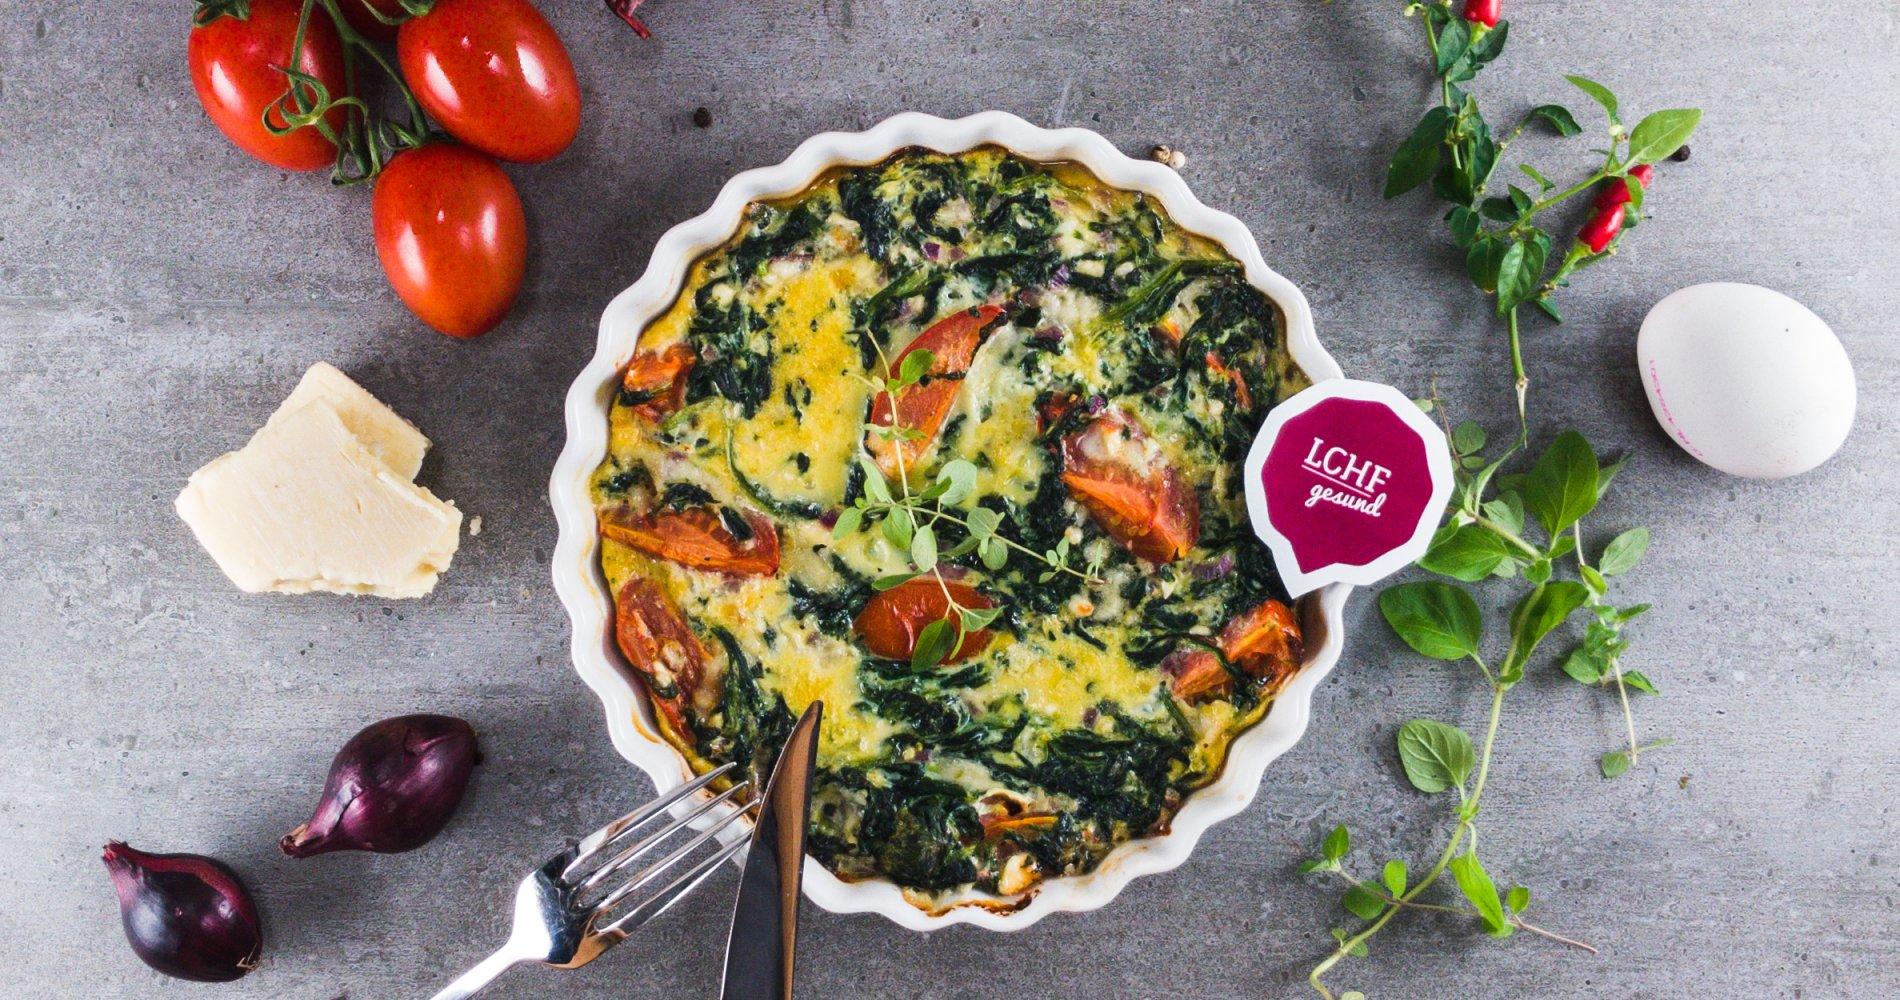 Rezept Low Carb: Spinat-Tomaten-Frittata - LCHF-gesund.de